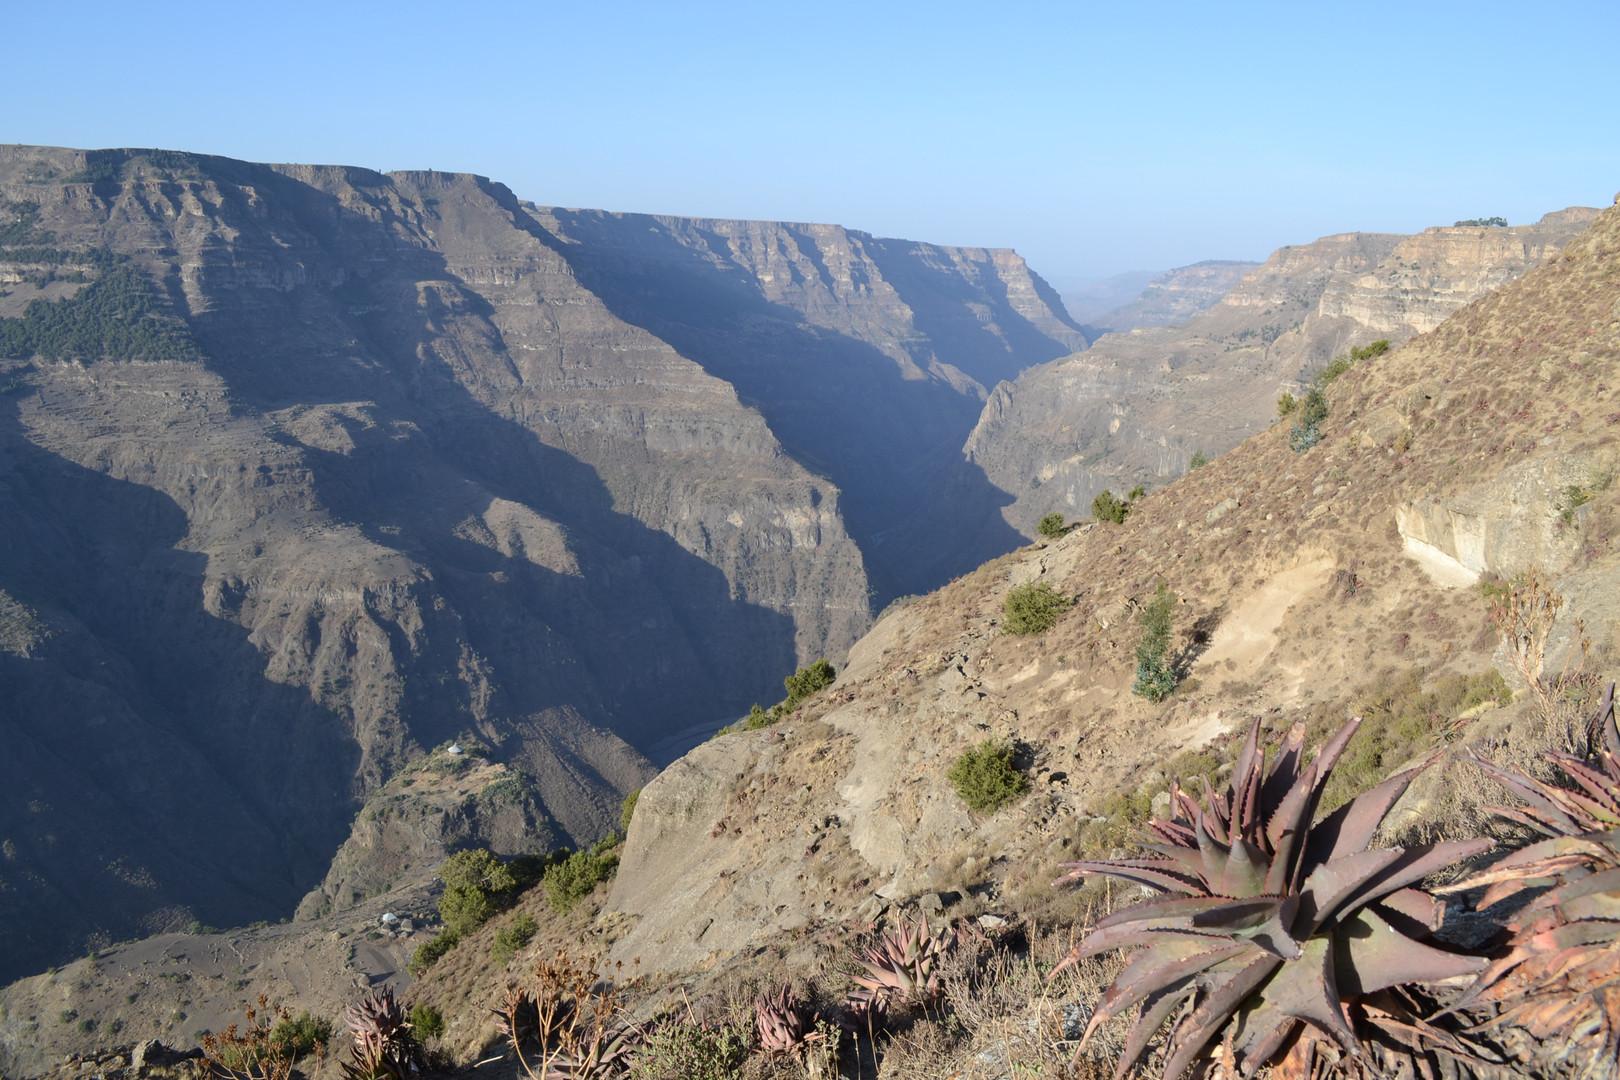 The 'prison mountain' of Mäloṭ Amba jutting out into the Žiṭa gorge, Wadla wäräda